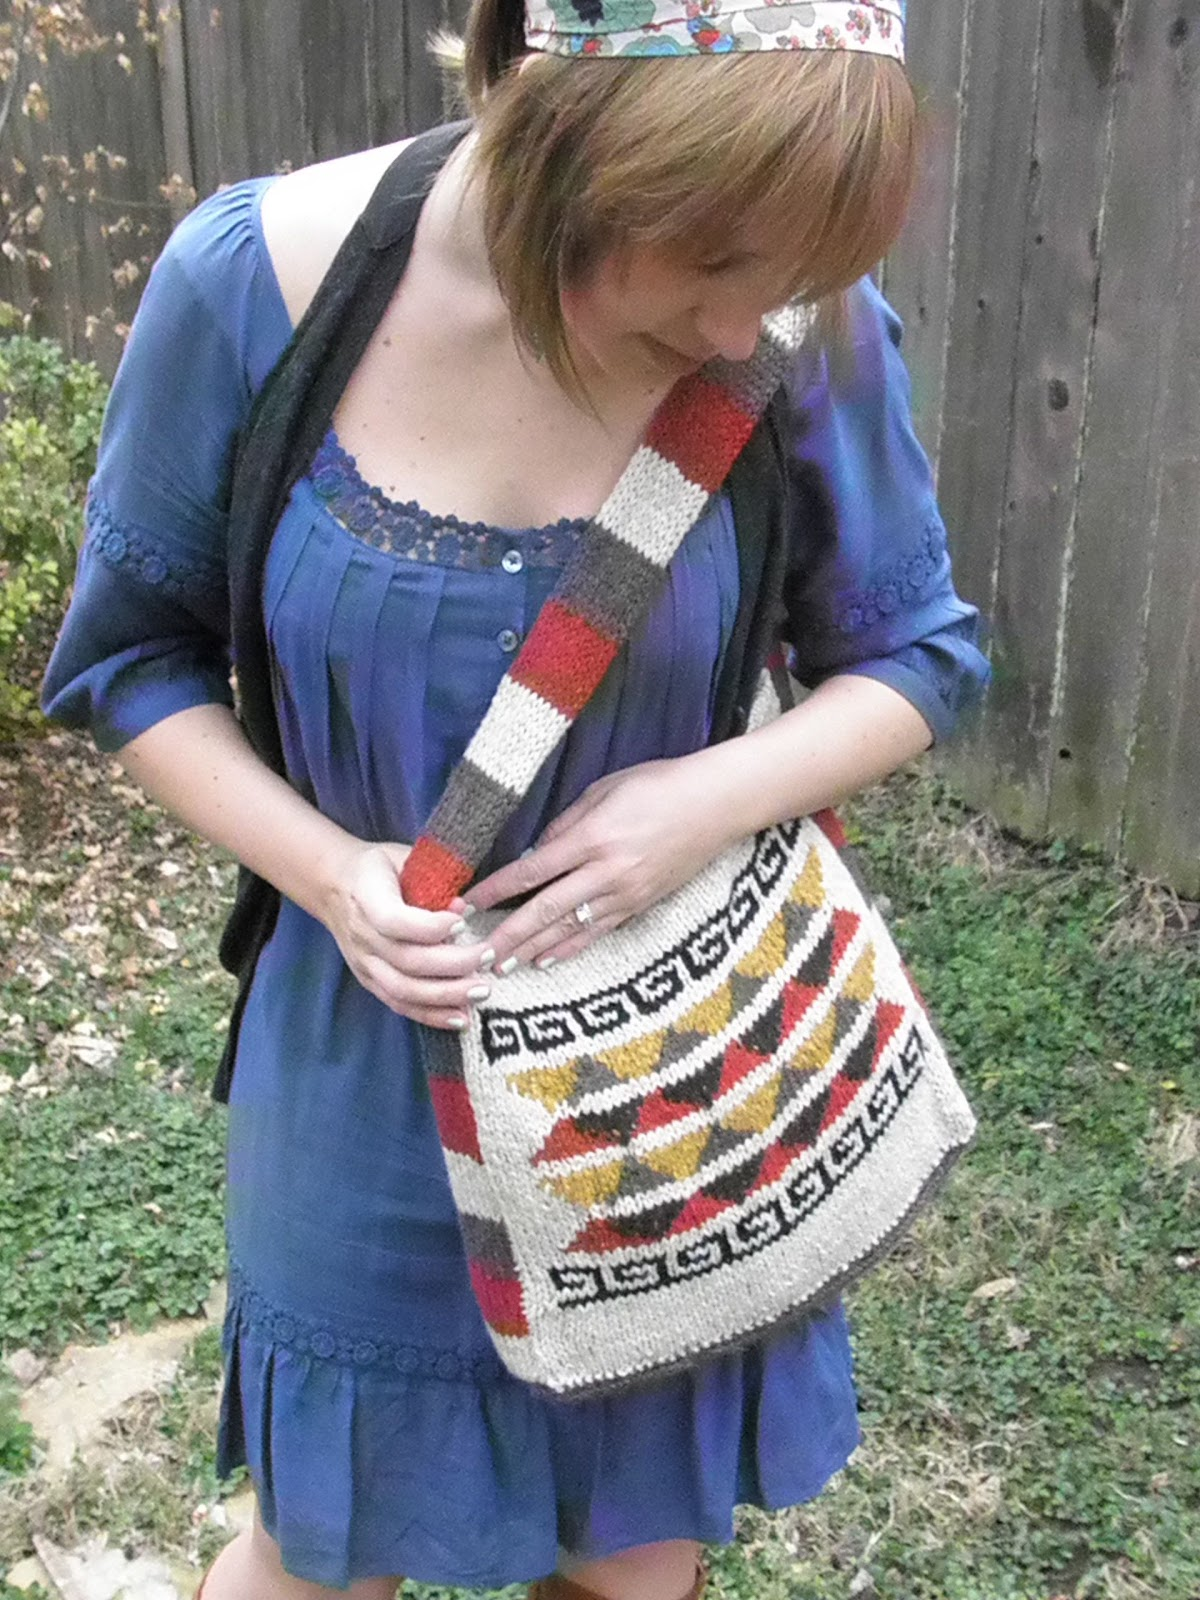 elletrain knits *: Bohemian Satchel Knitting Pattern